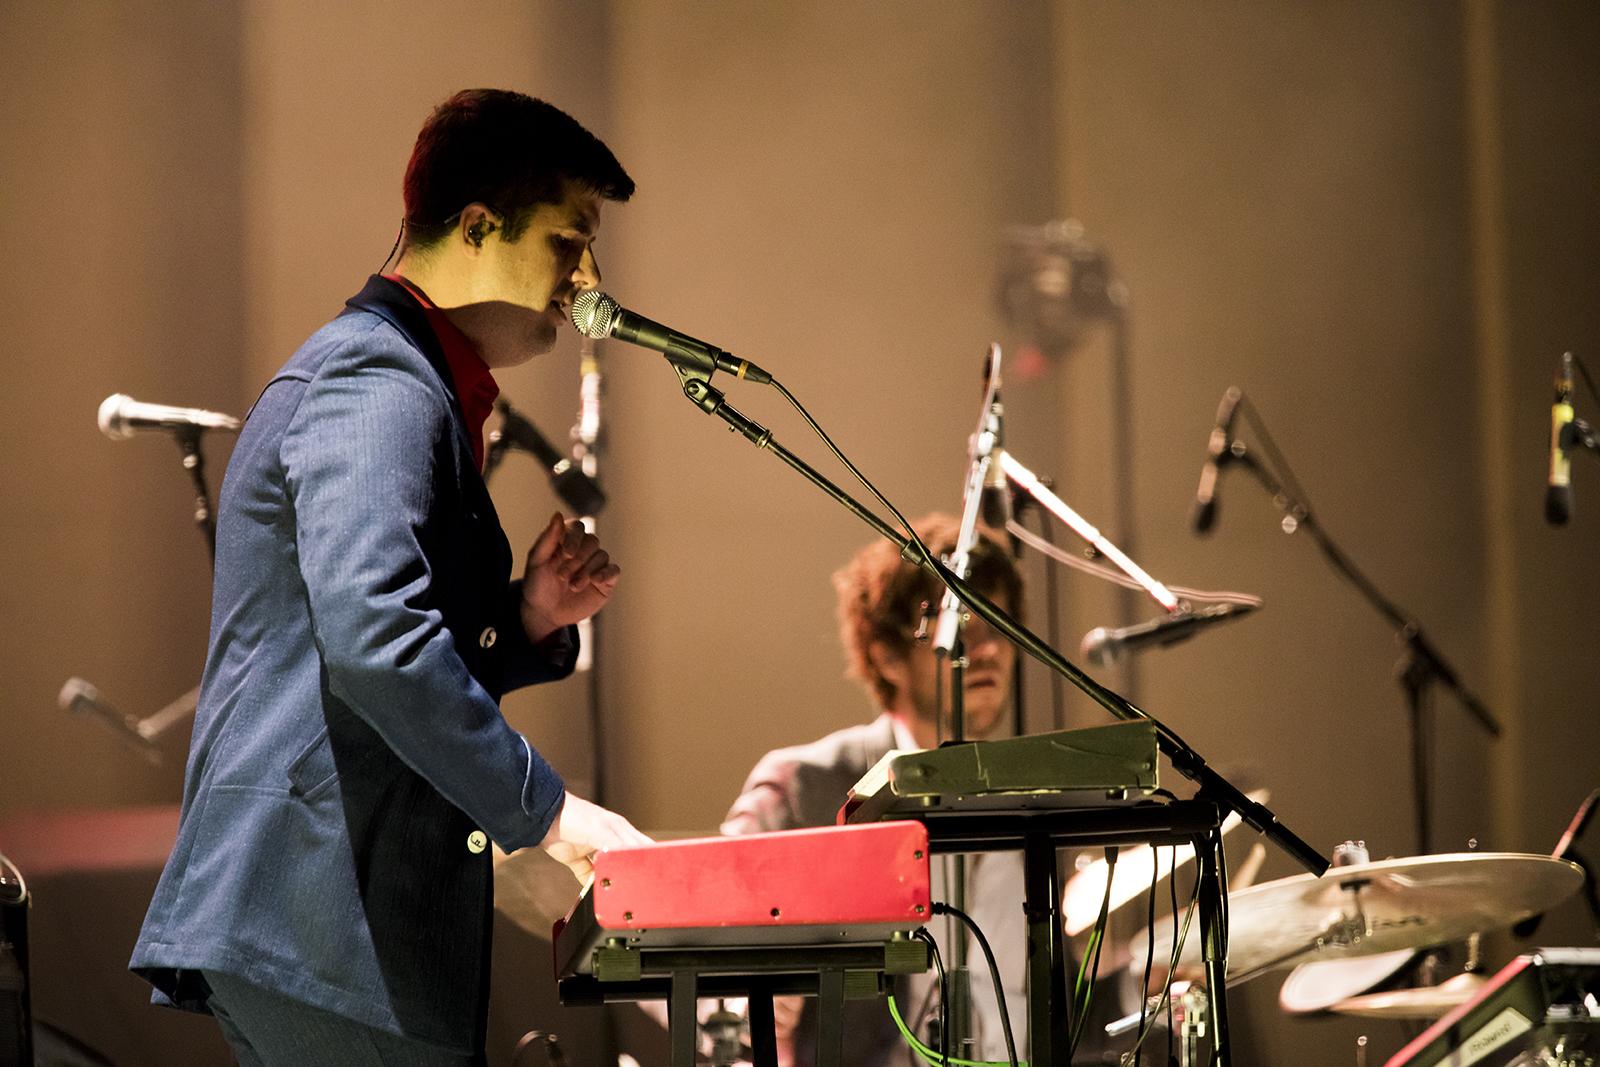 Arctic Monkeys show their range, vitality at Hollywood Bowl